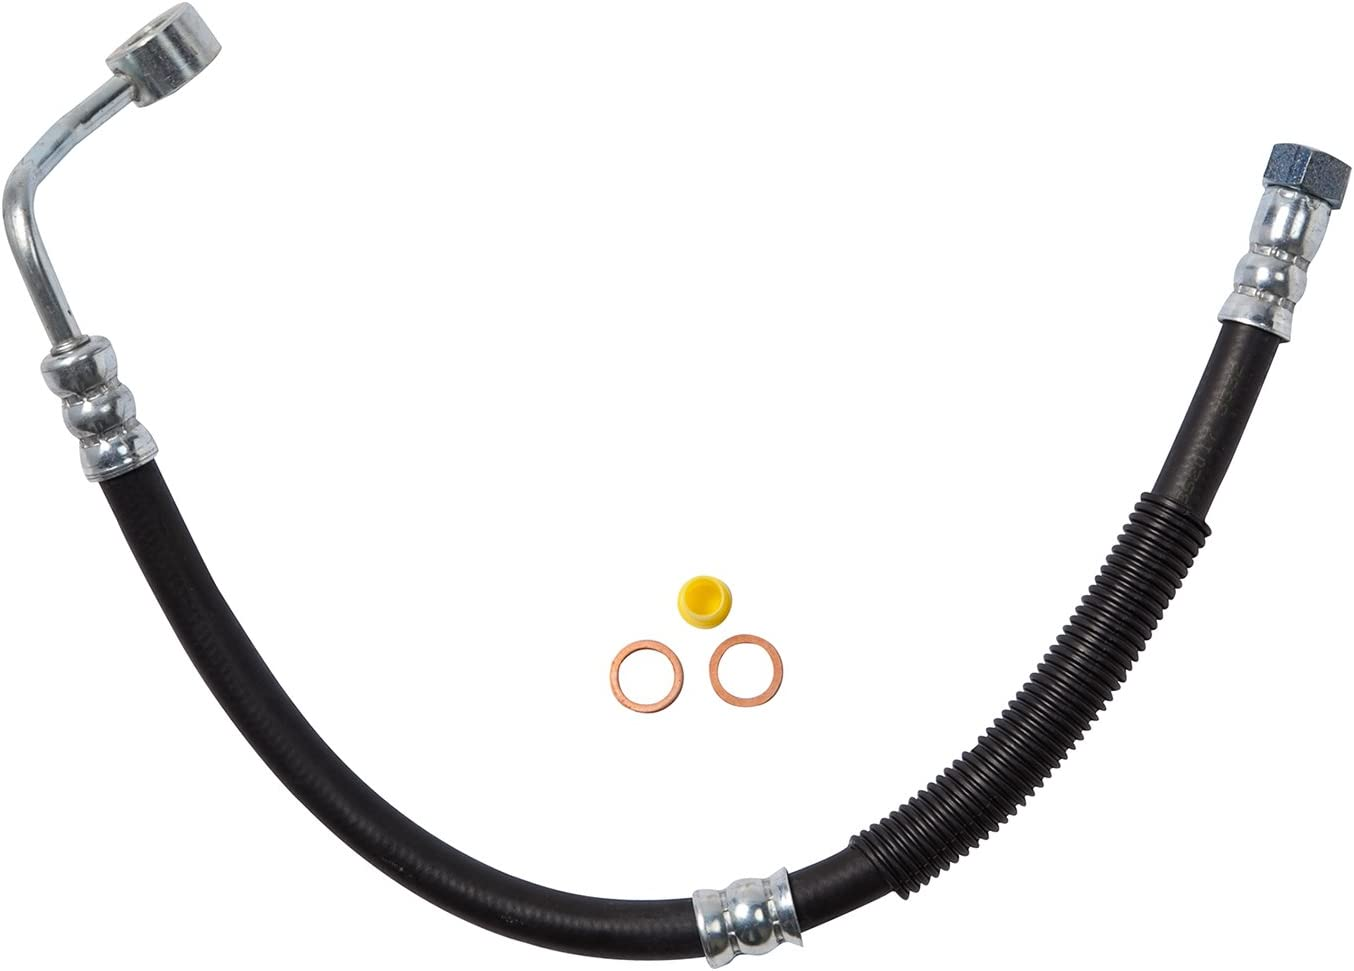 Edelmann 80469 Power Steering Pressure Line Hose Assembly